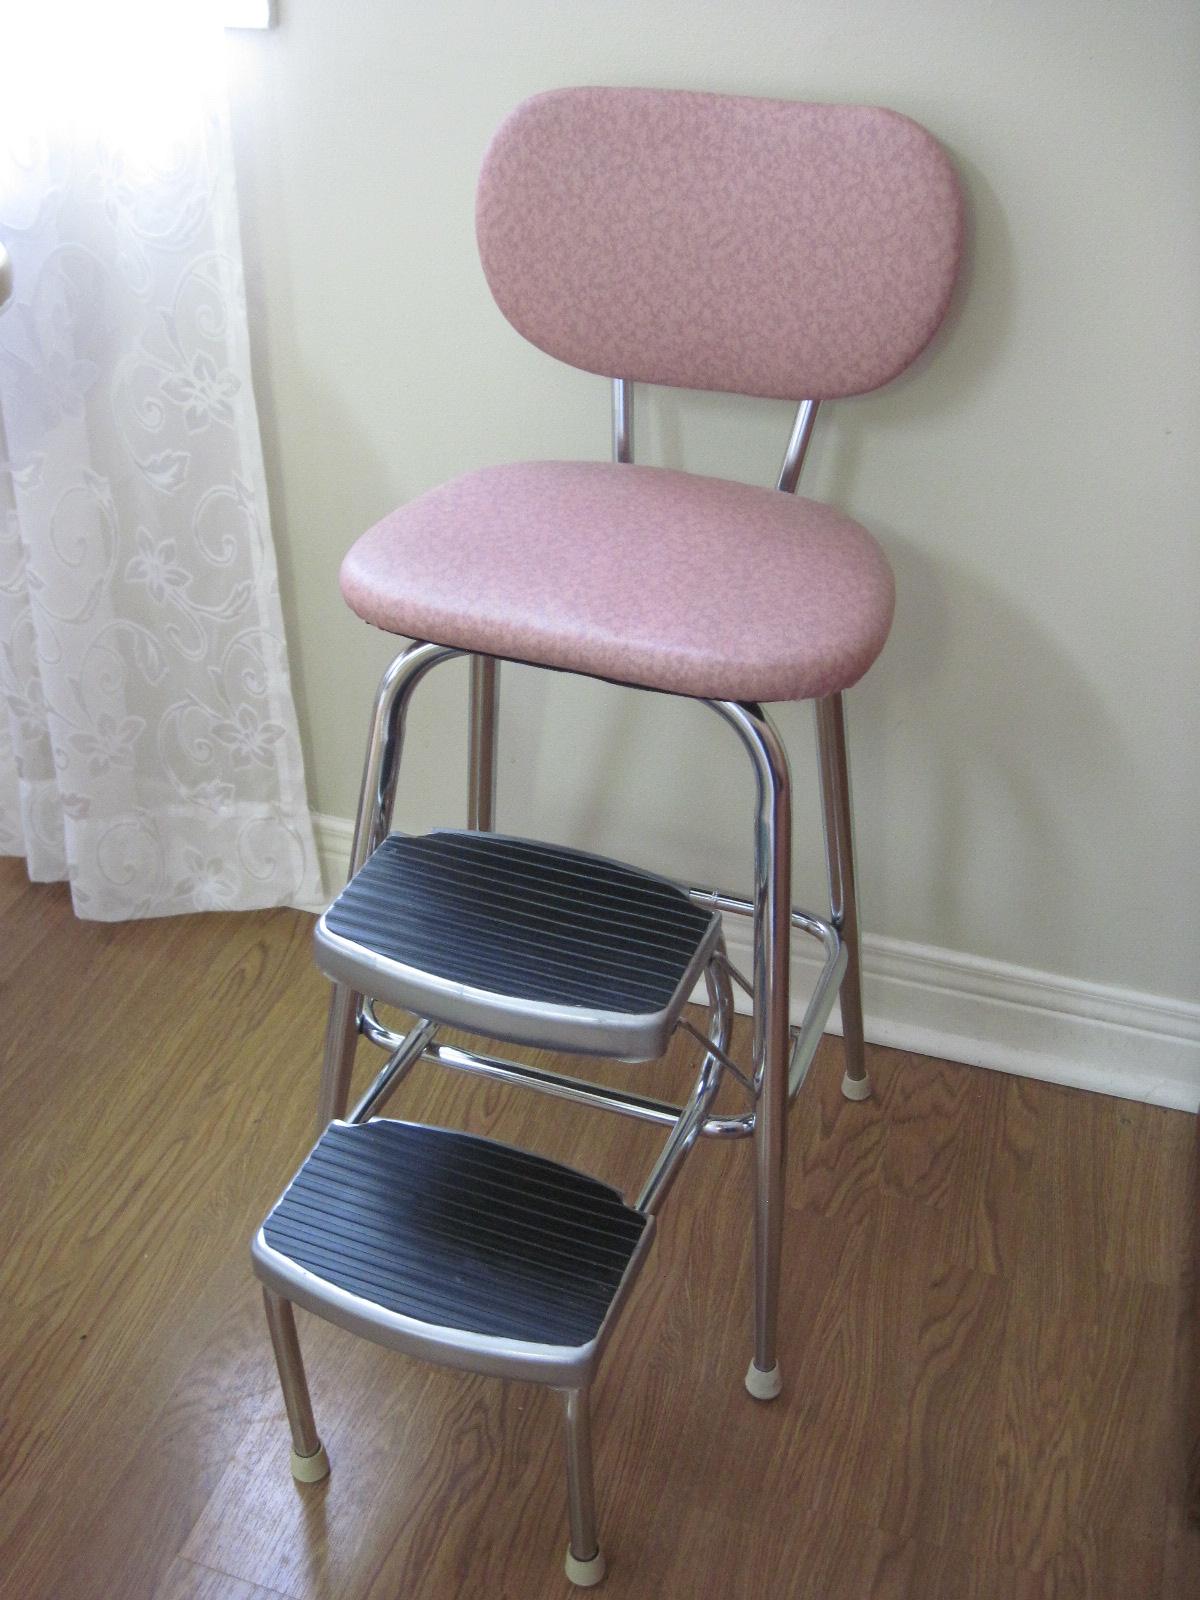 old fashioned kitchen chair step stool island lighting vintage furniture fabfindsblog